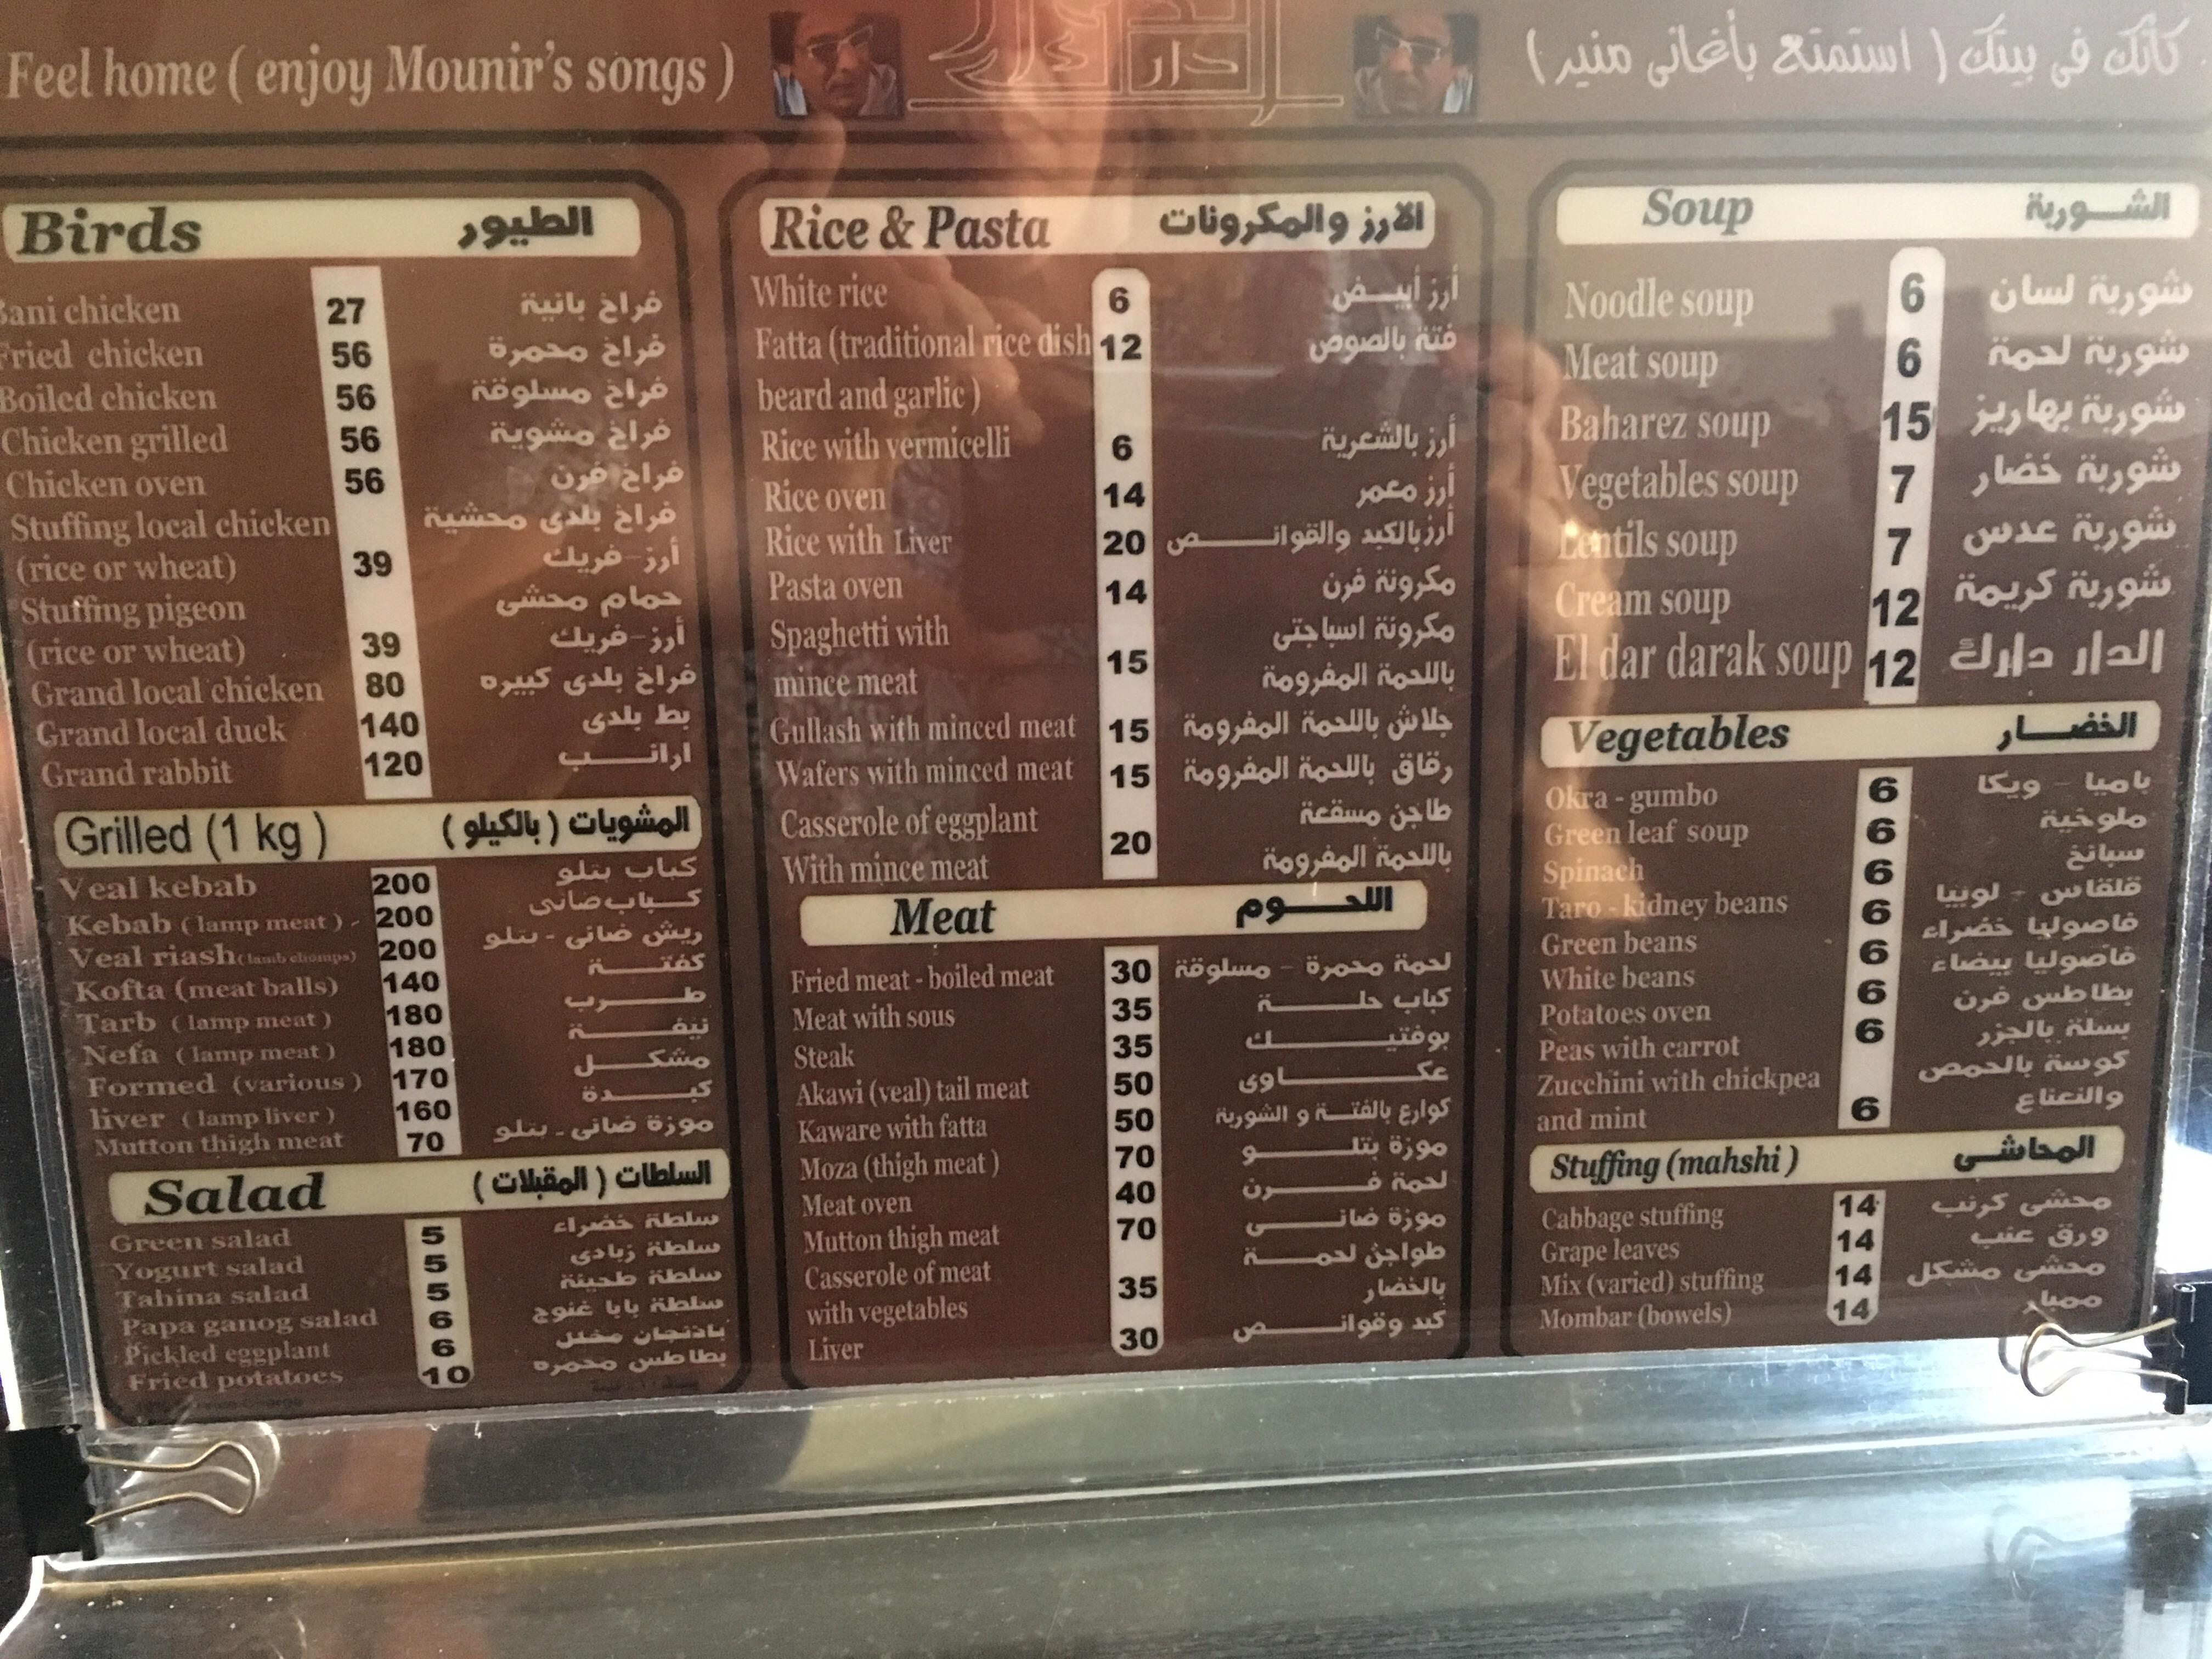 Speisekarte El Dar Darak Restaurant in Hurghada